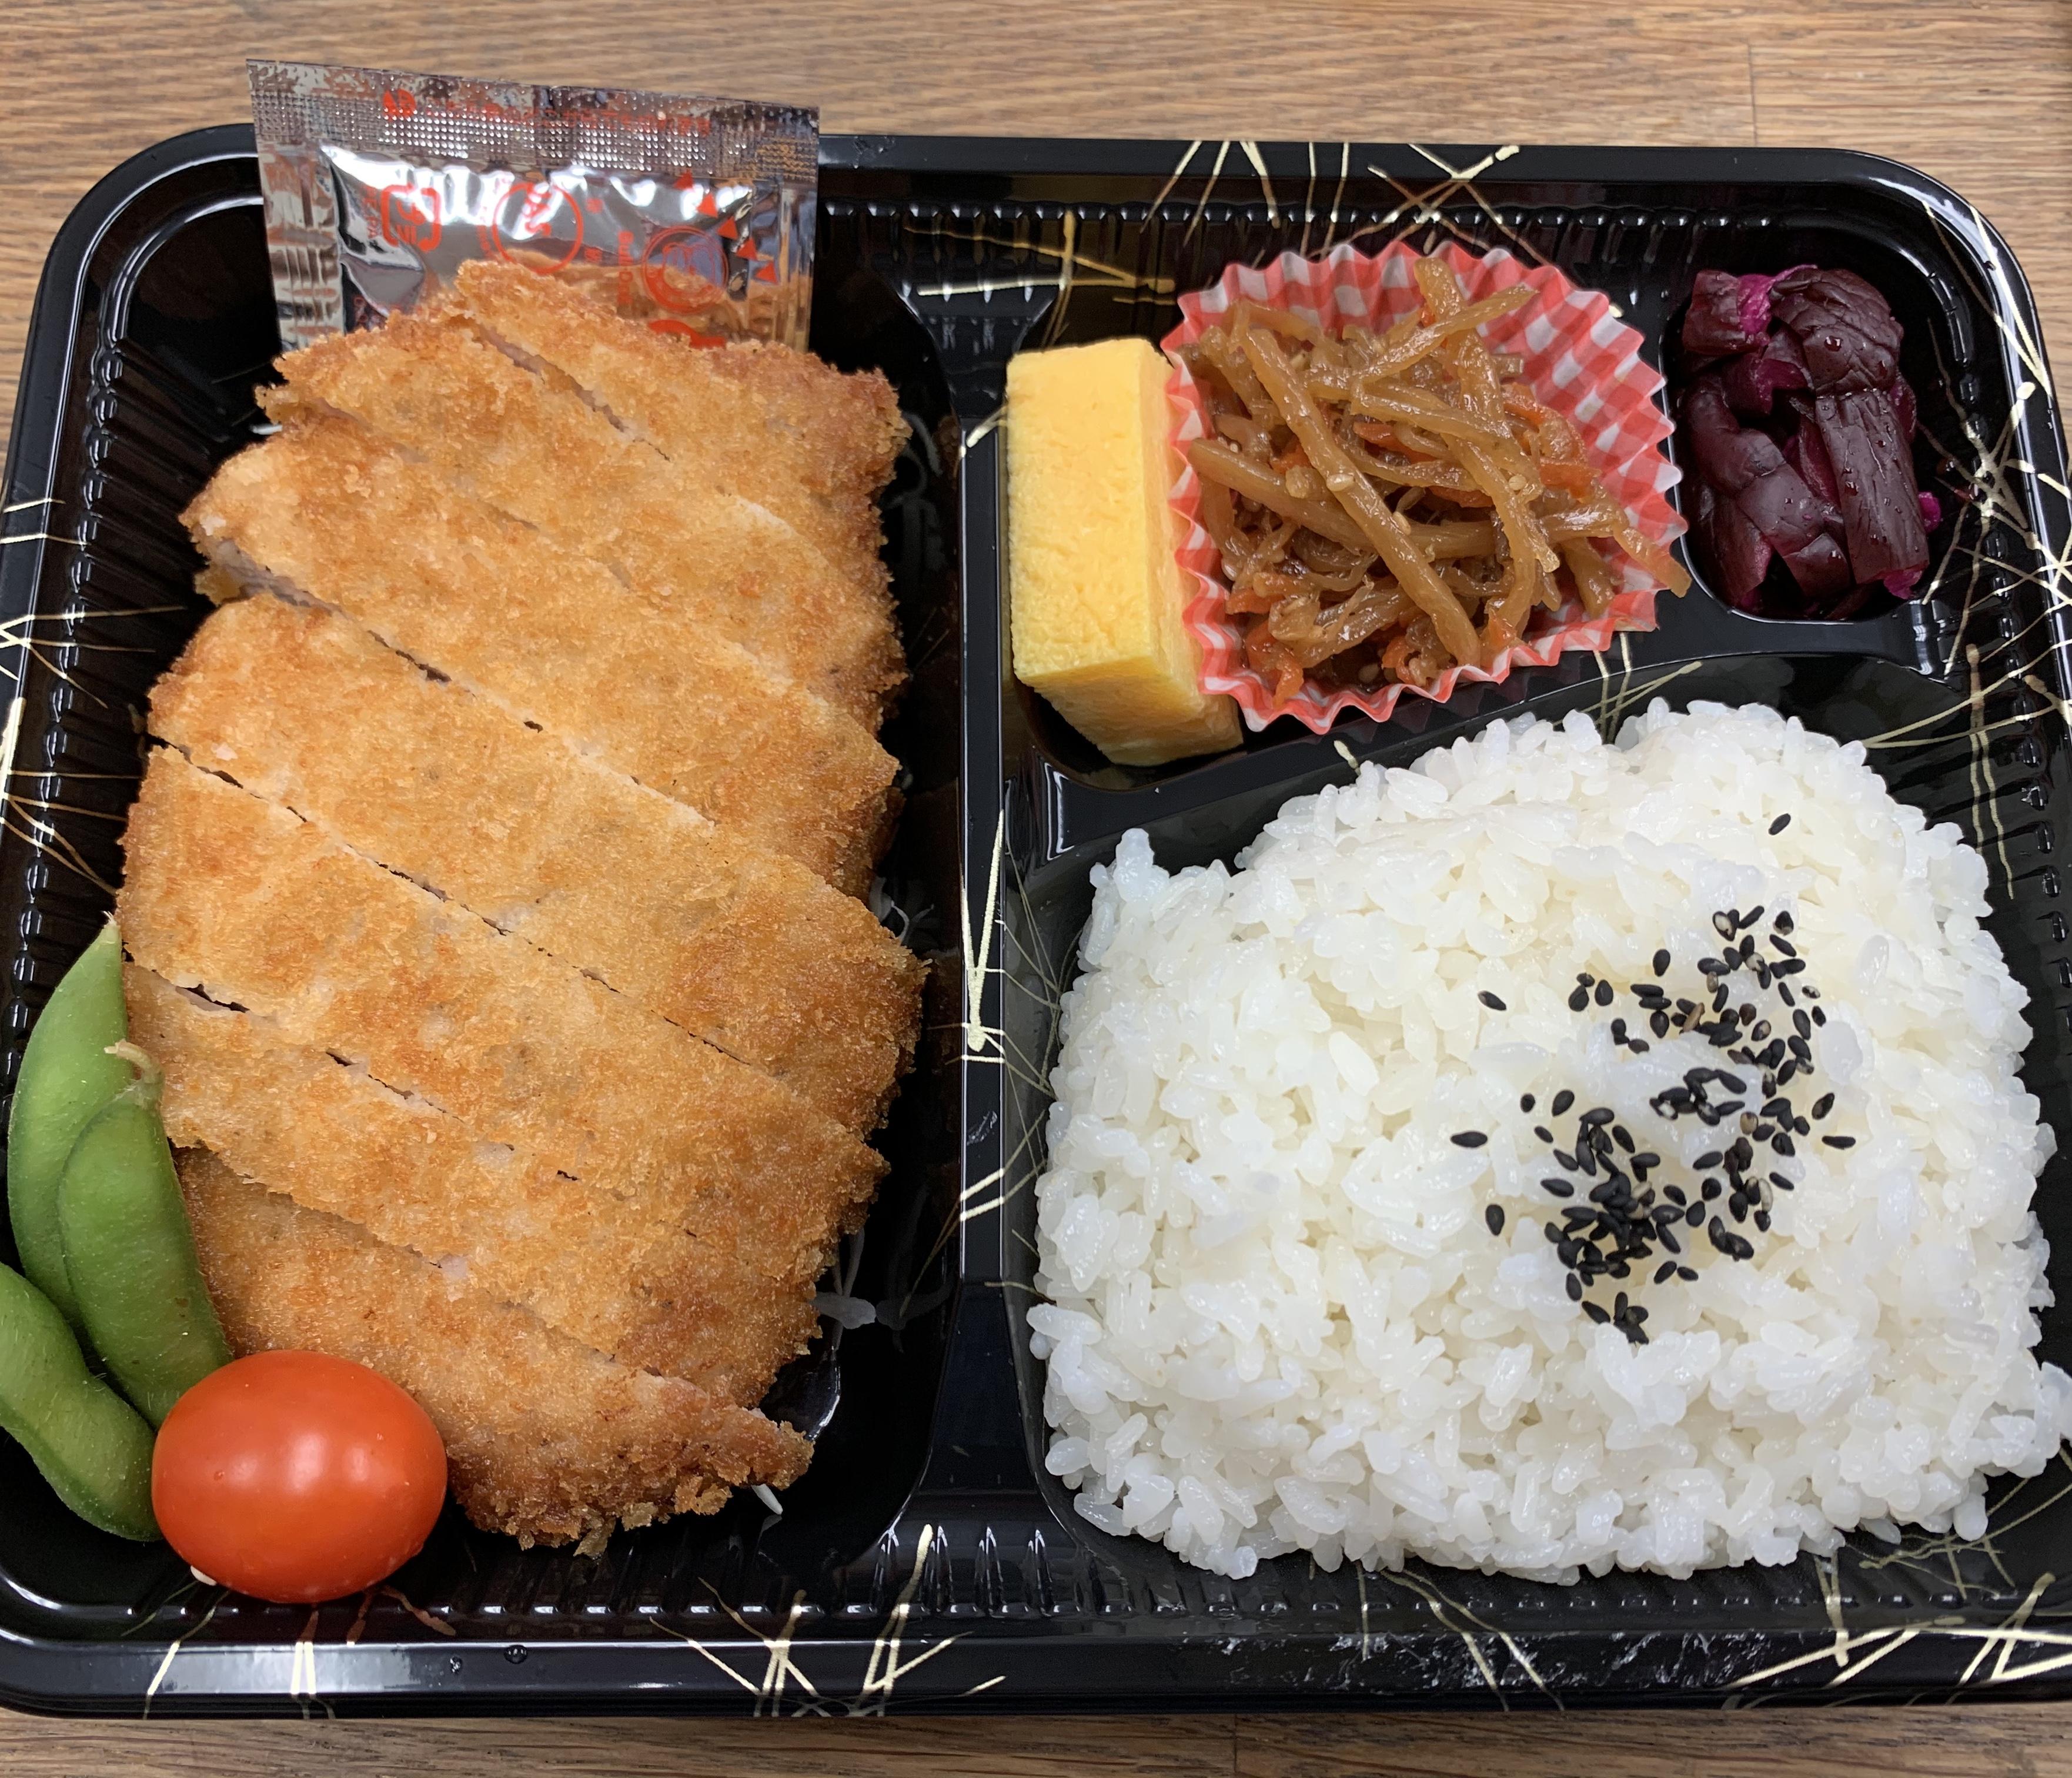 The pork cutlet bento box from Asahi Imports